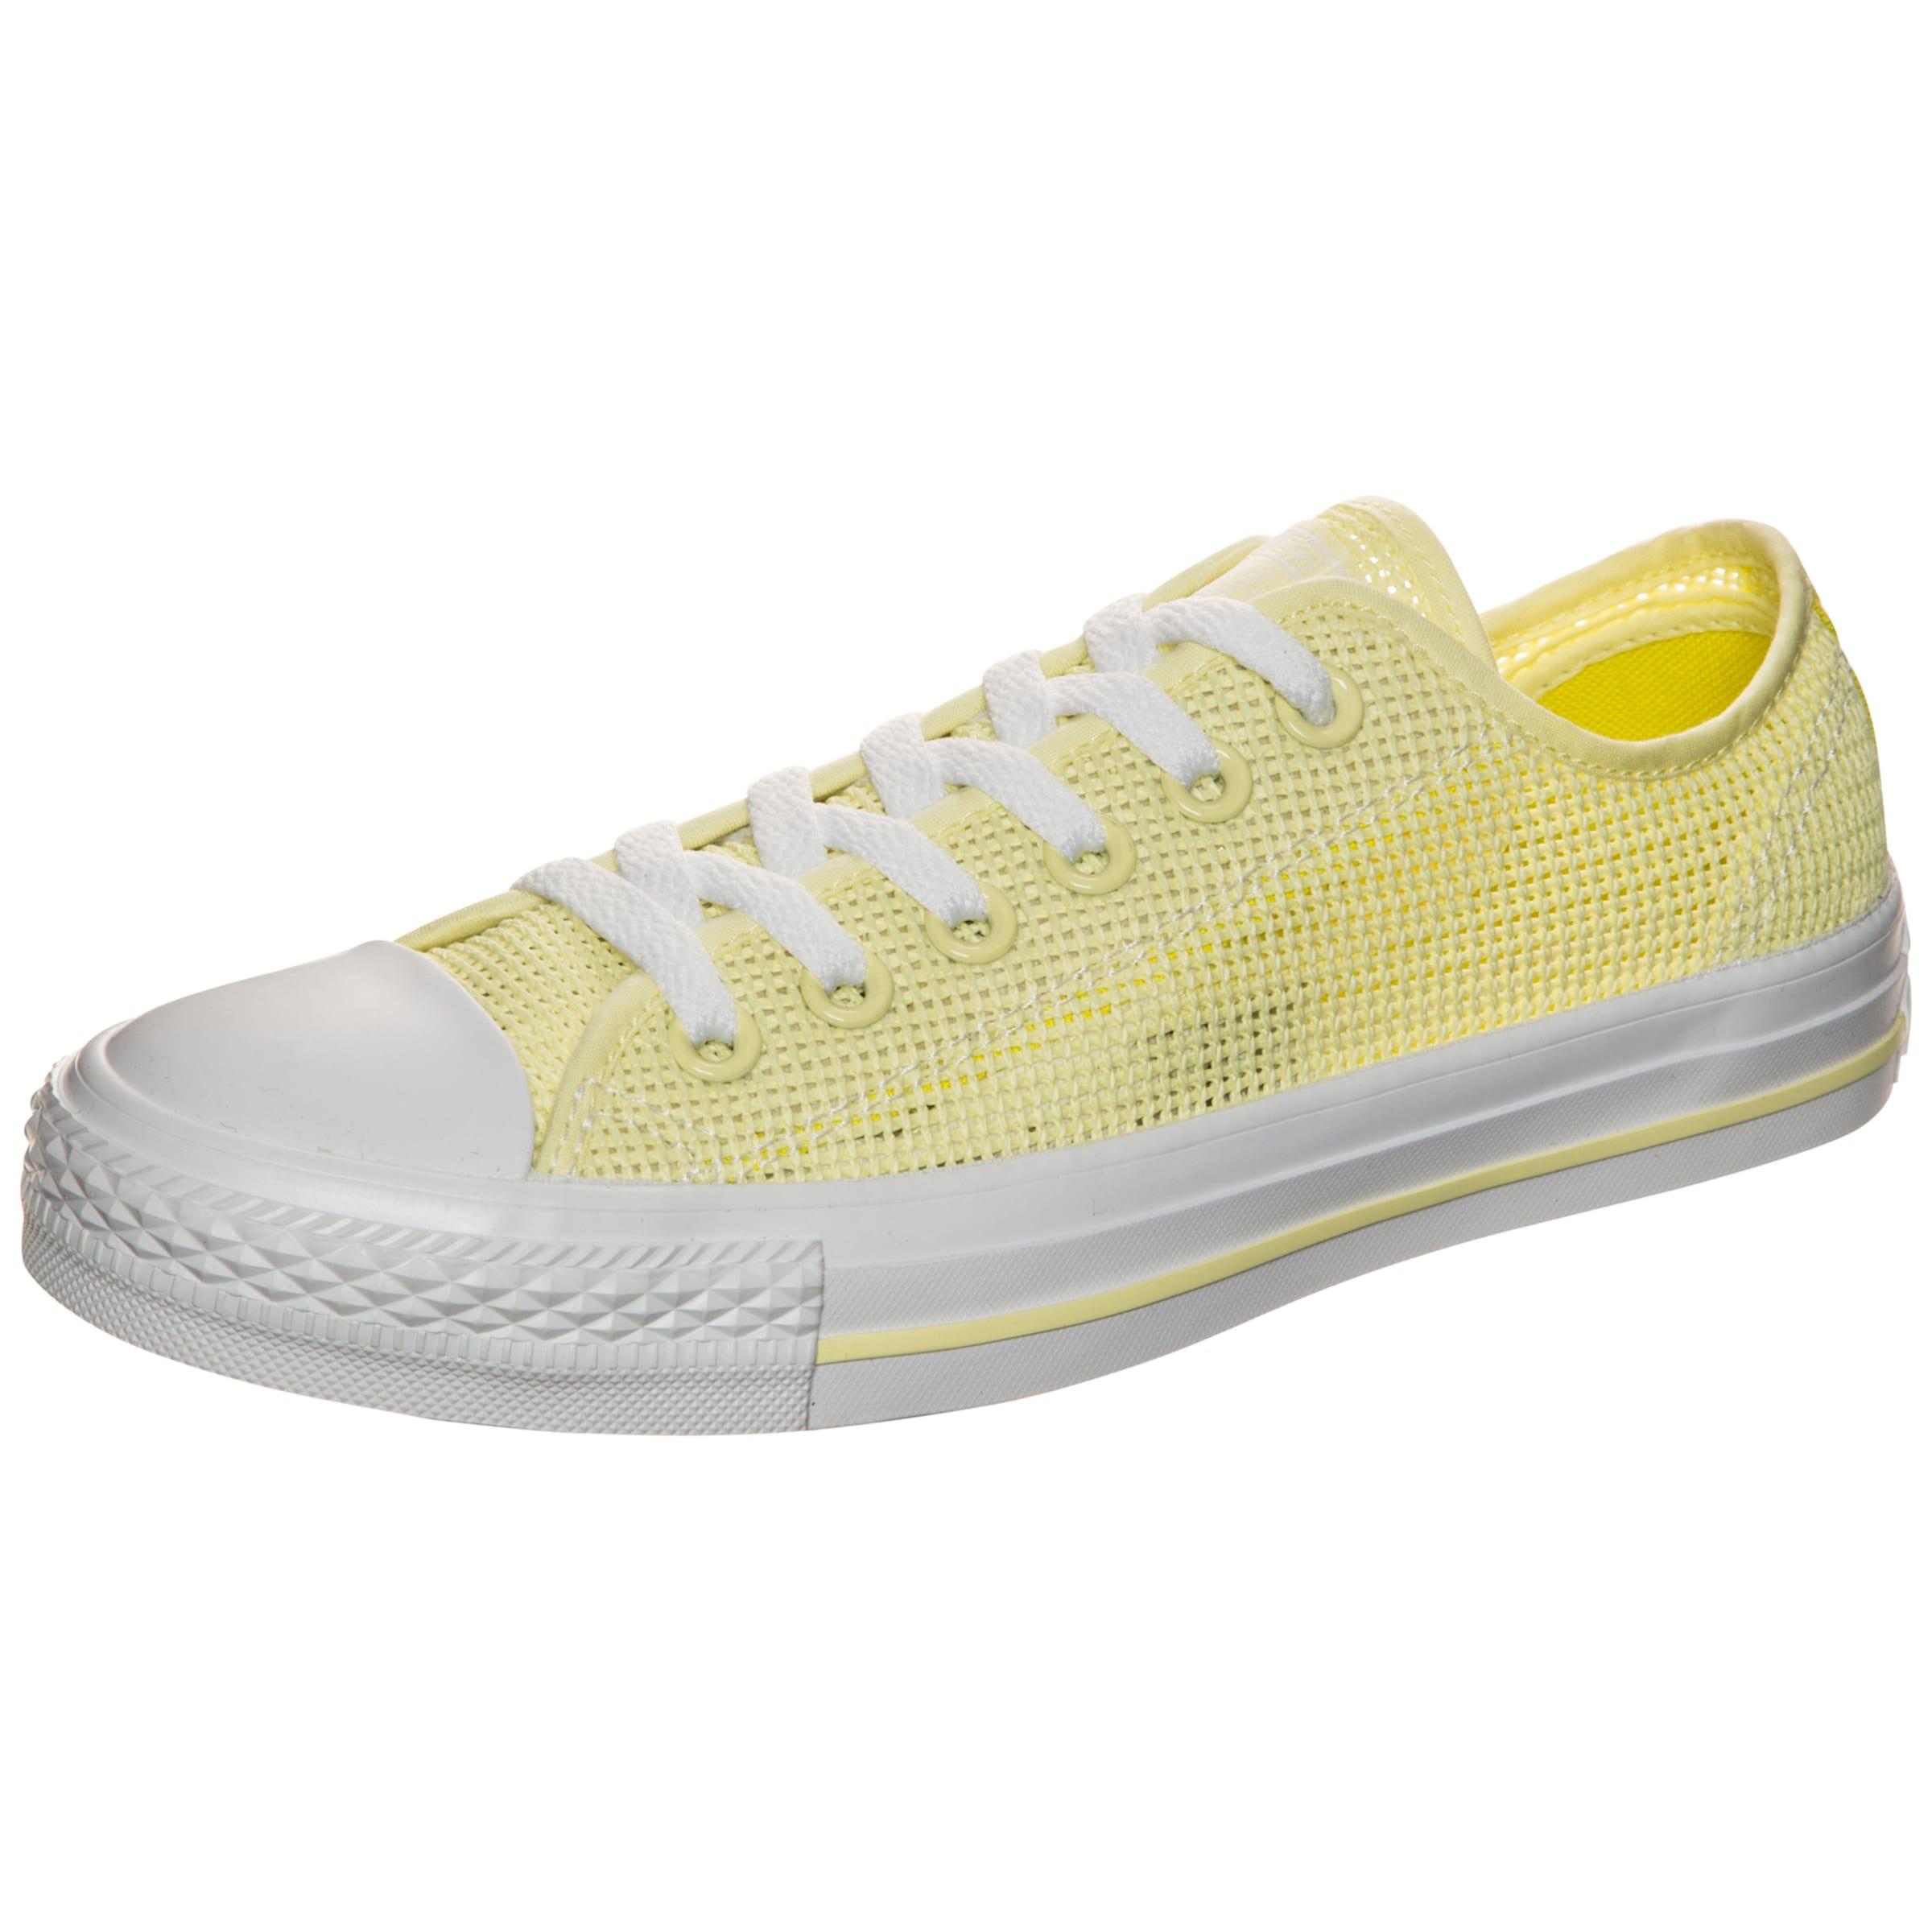 CONVERSE 'Chuck Taylor All Star OX' Sneaker Damen Freies Verschiffen Mode-Stil Geniue Händler Günstiger Preis Perfekte Online-Verkauf IqYDw60Ff